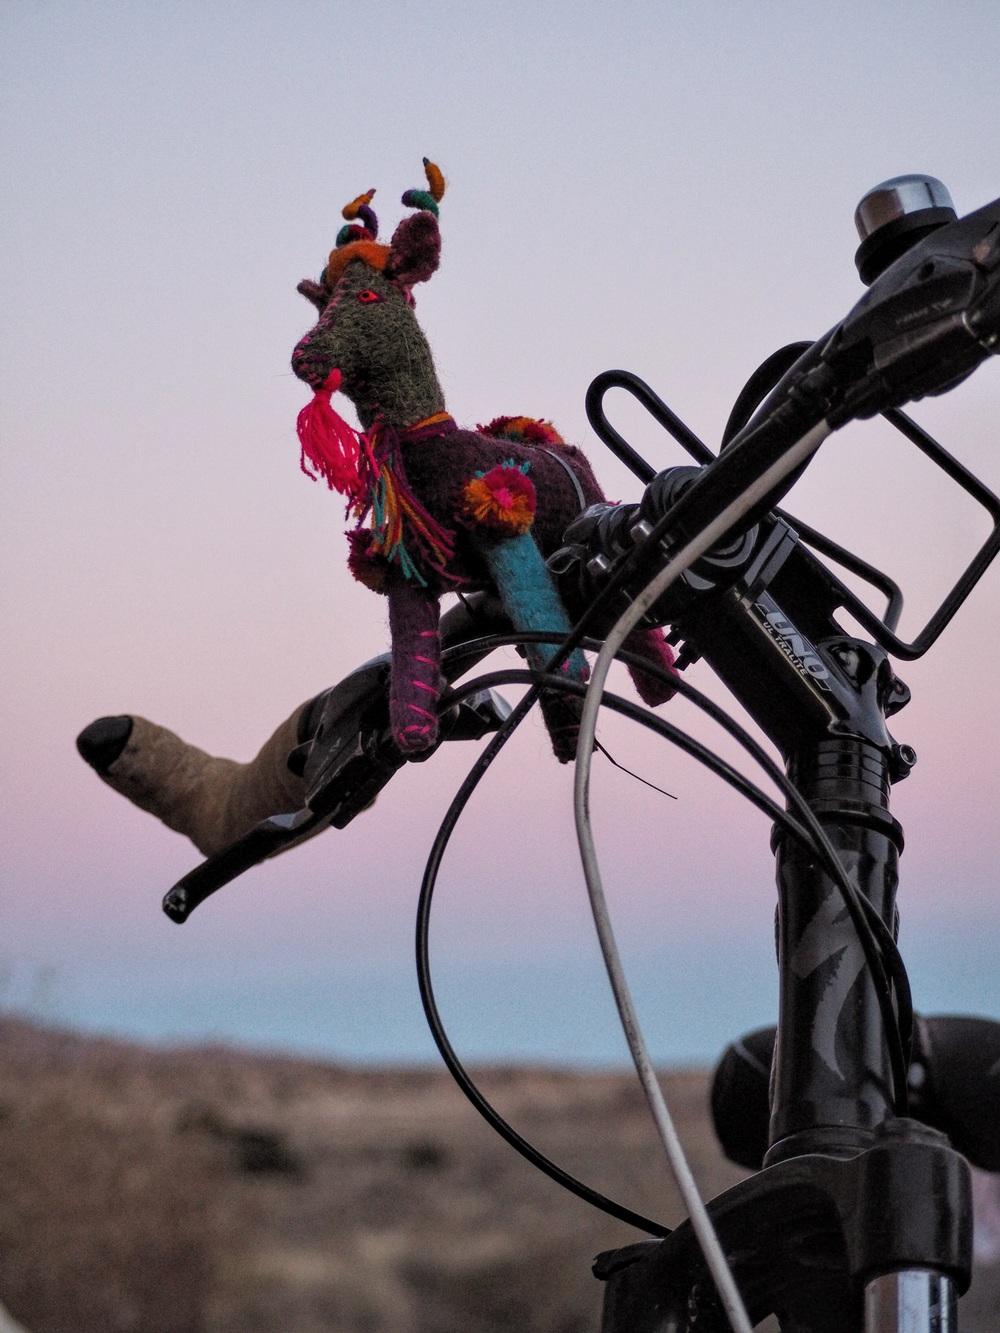 My bike mascot, a Peruvian mountain goat